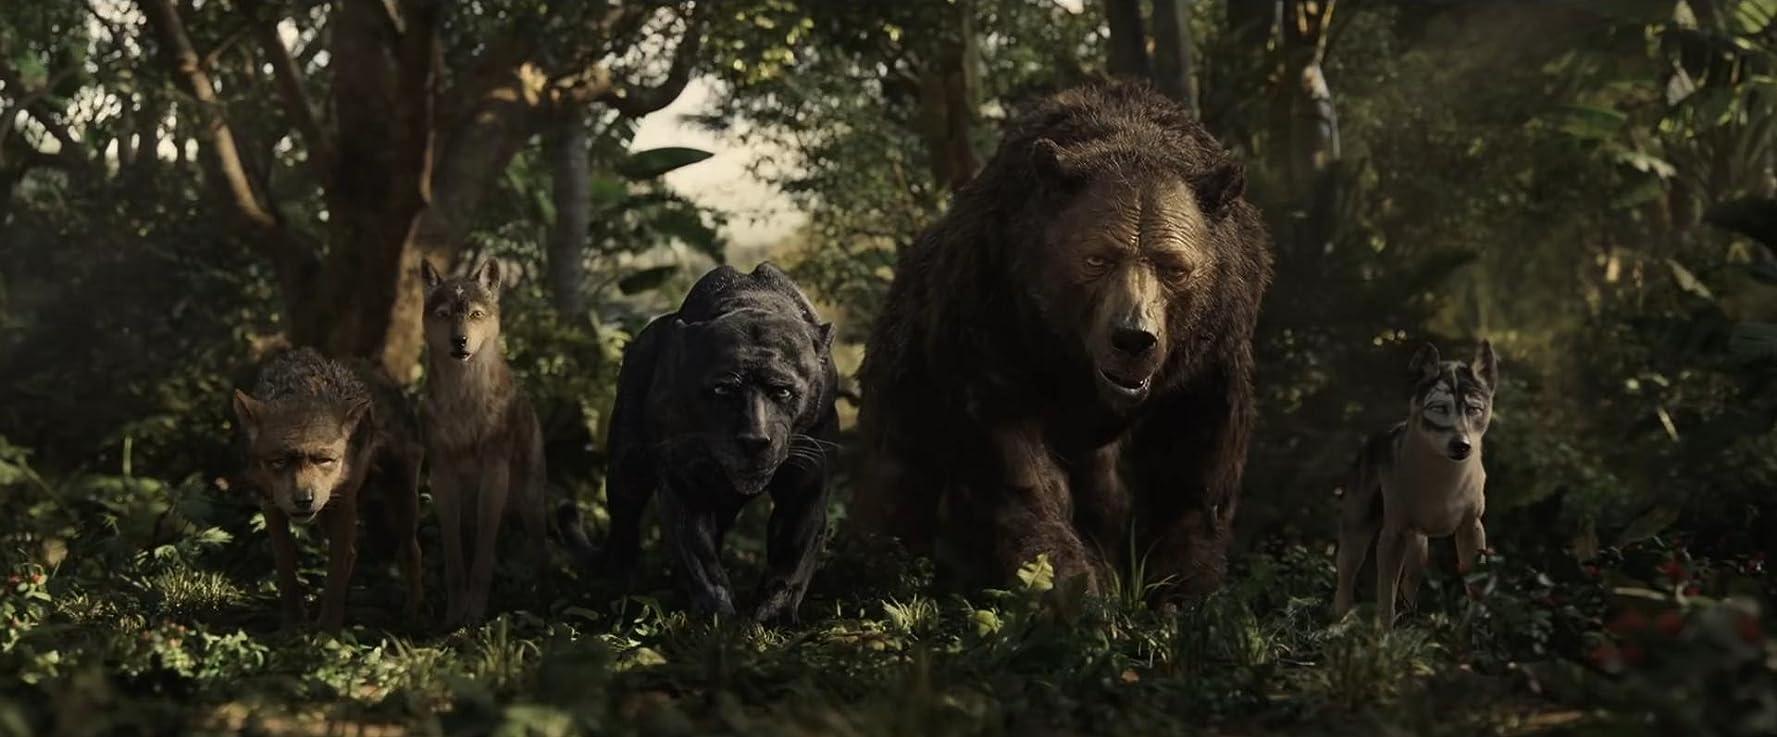 Christian Bale, Naomie Harris, Andy Serkis, and Jack Reynor in Mowgli (2018)